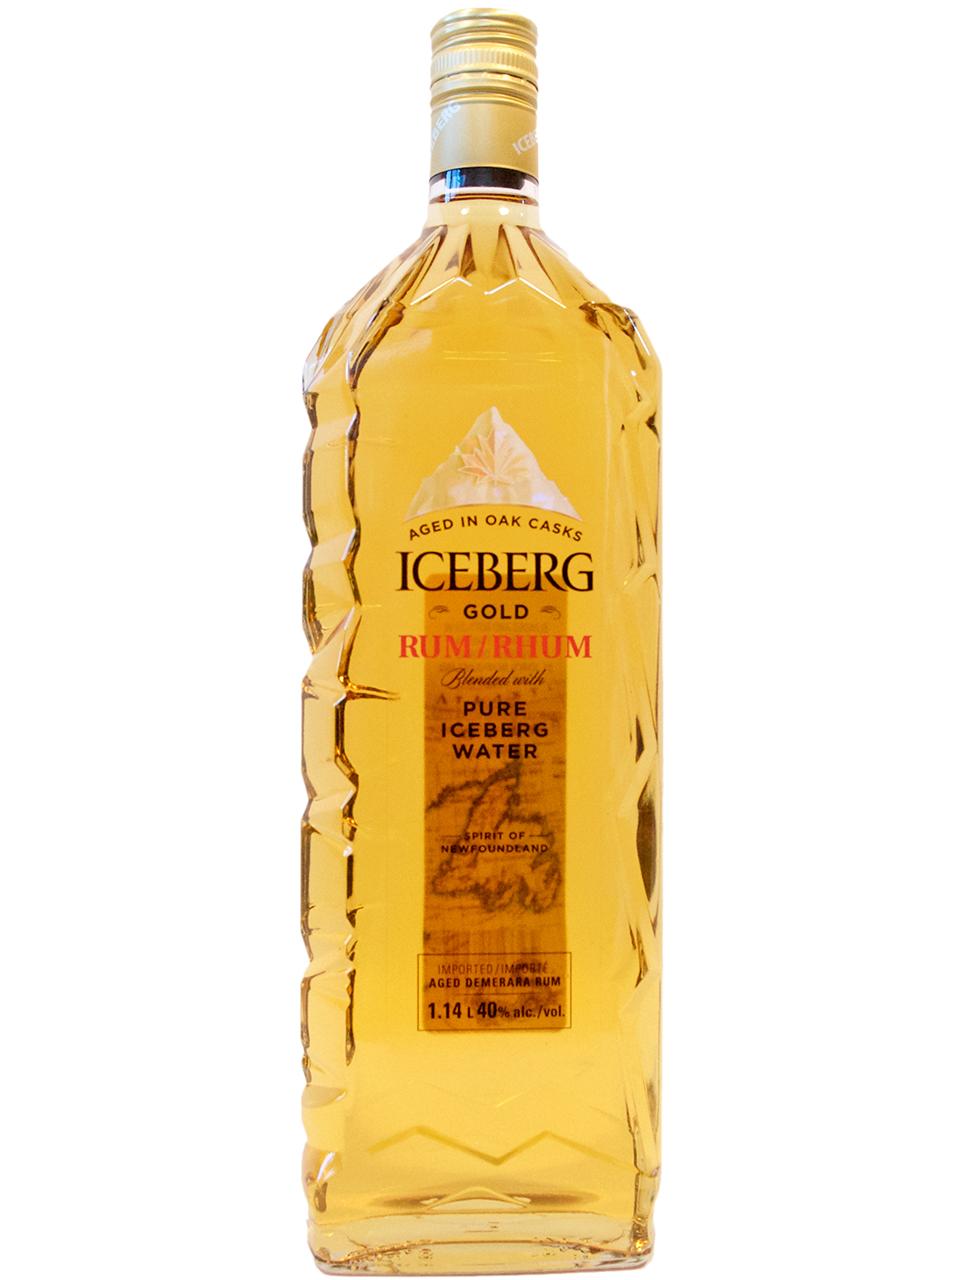 Iceberg Gold Rum